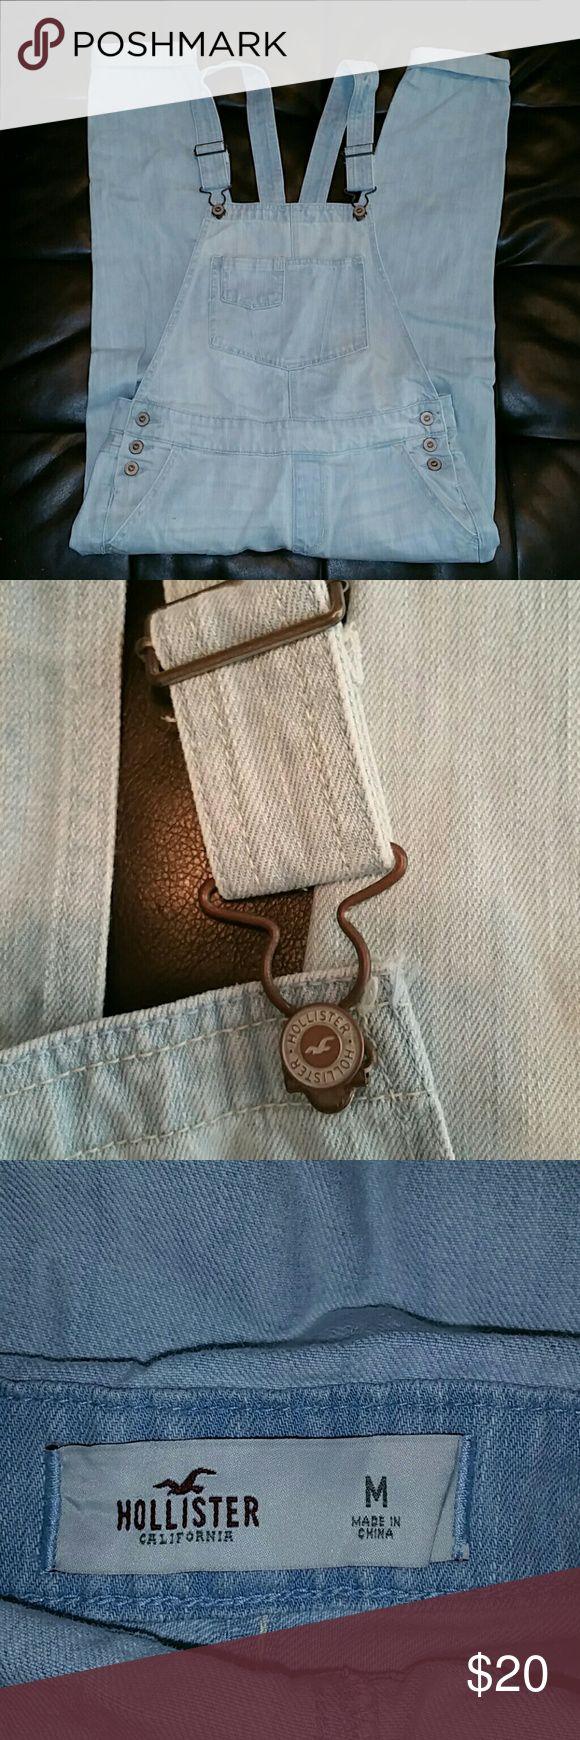 Hollister Overalls Brand new, never worn, light wash skinny overalls. Hollister Jeans Overalls